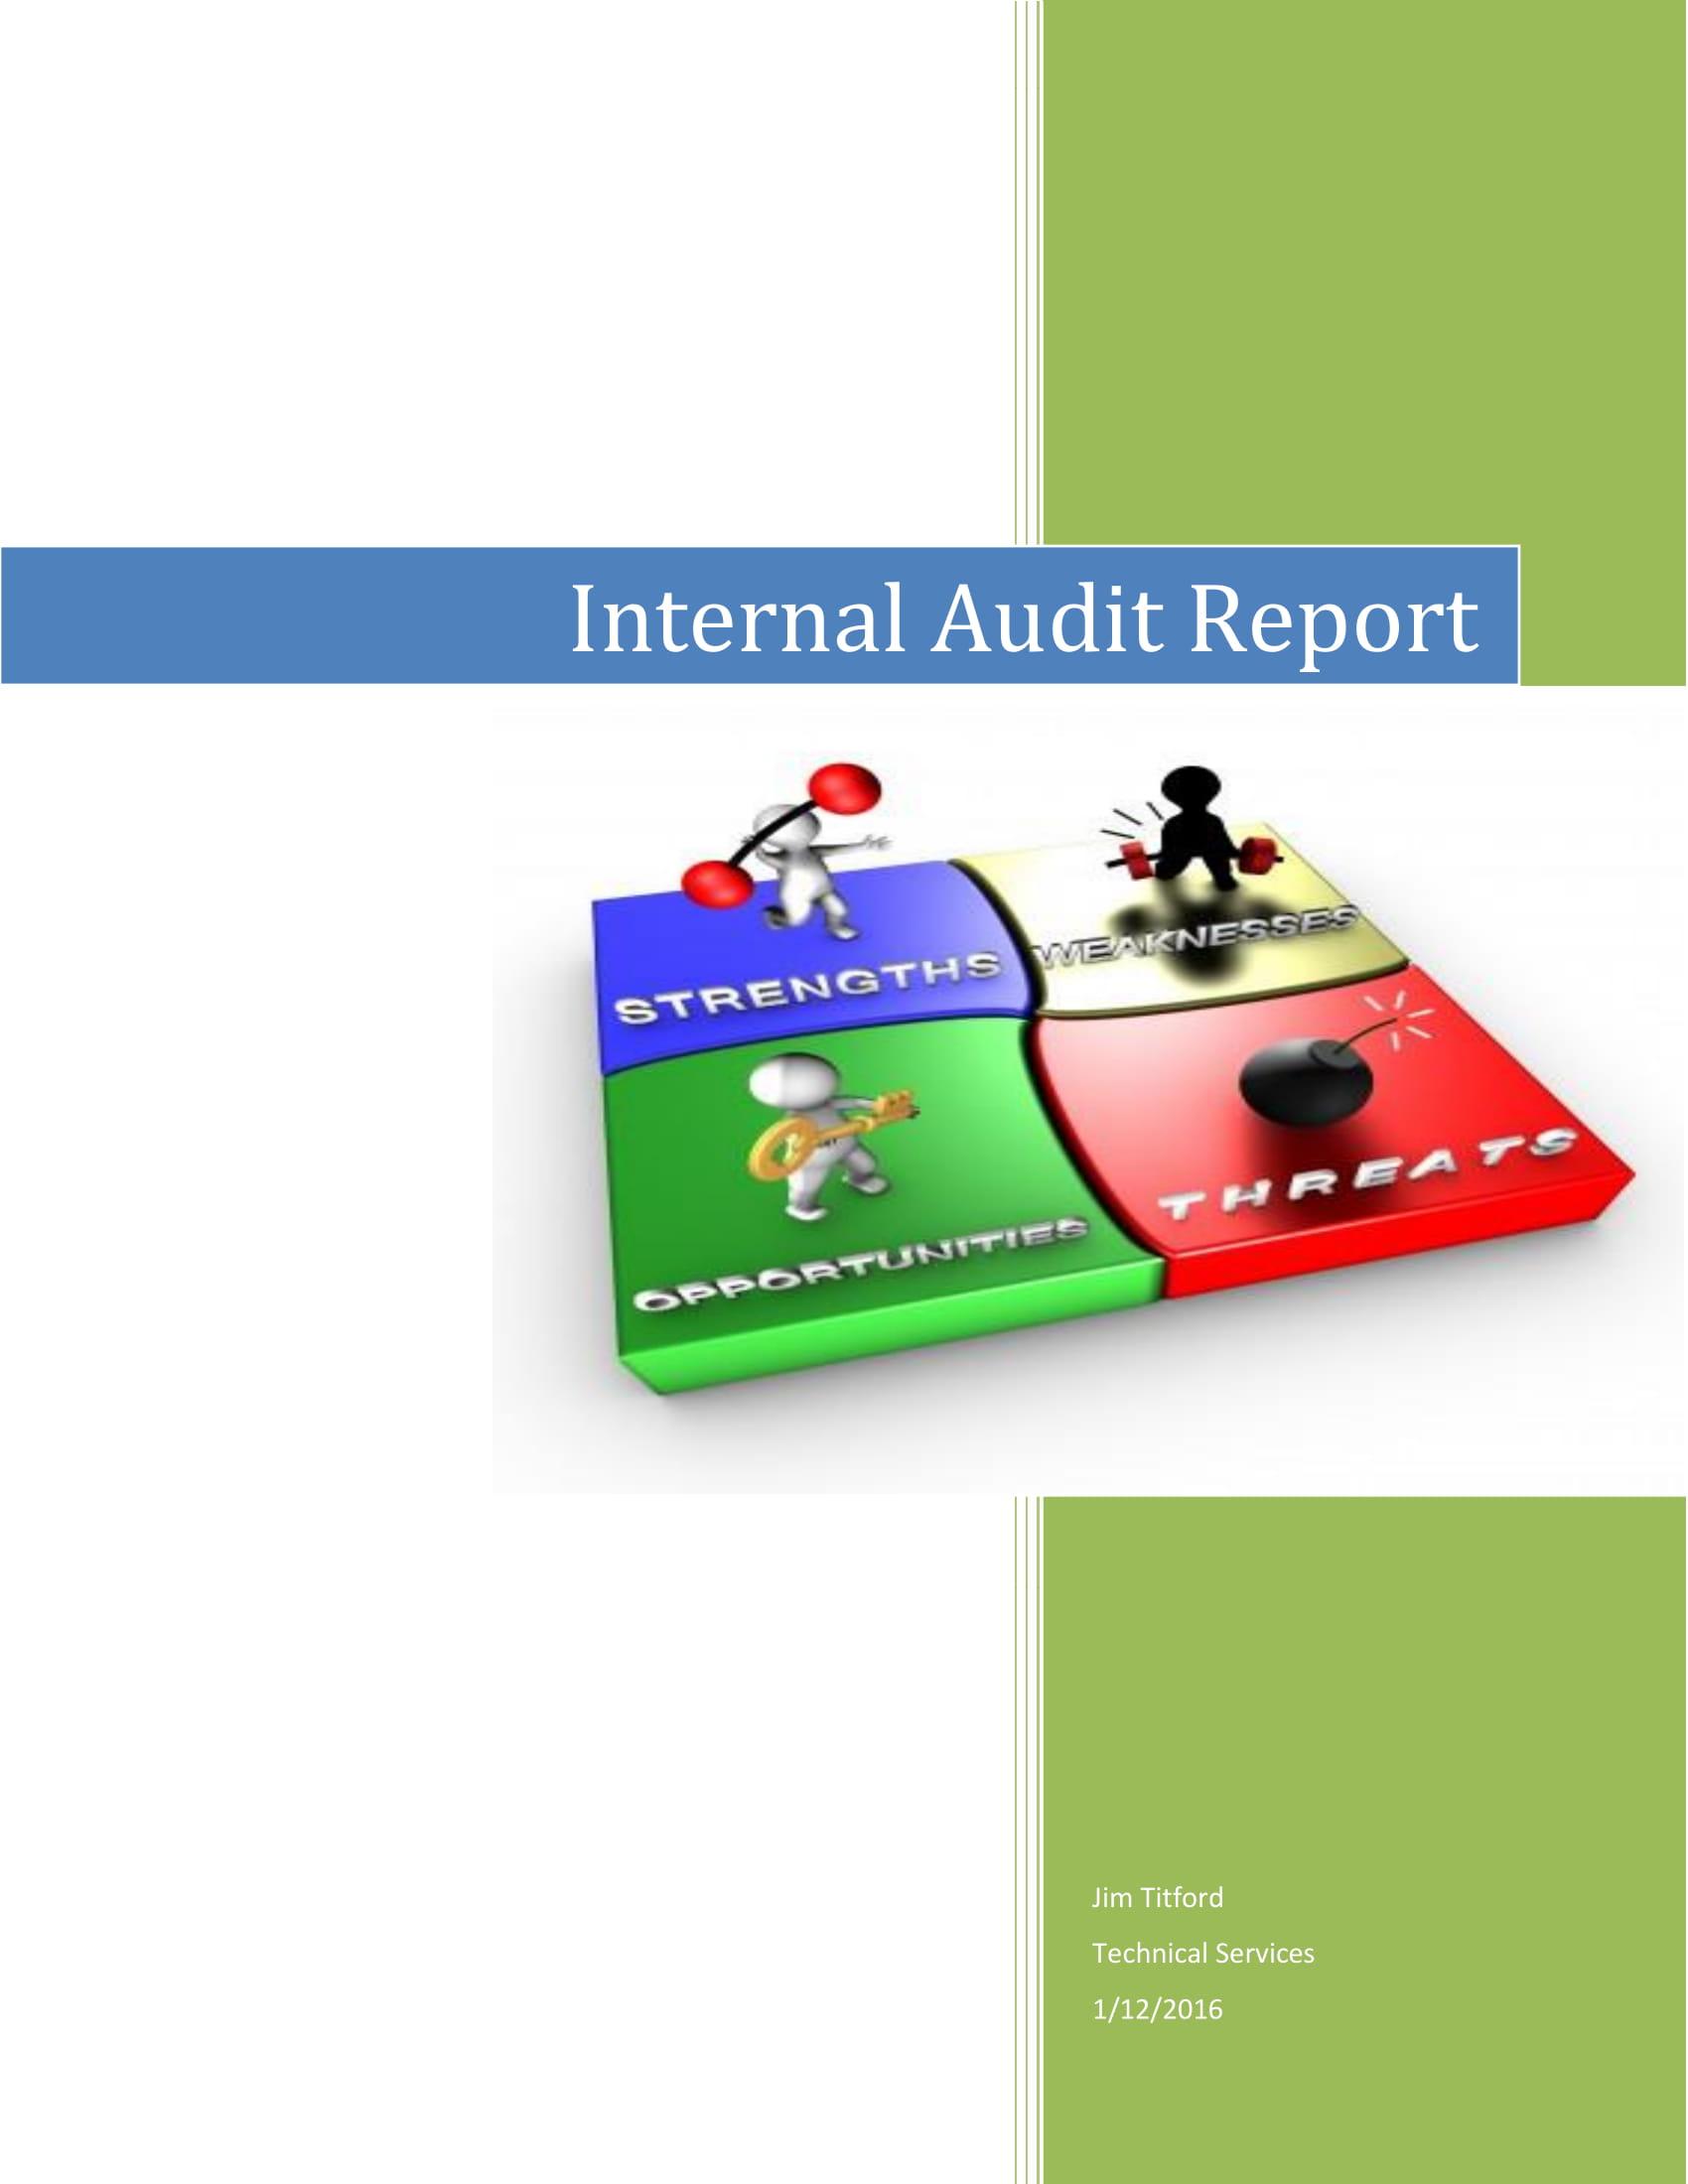 basic internal audit report example 1